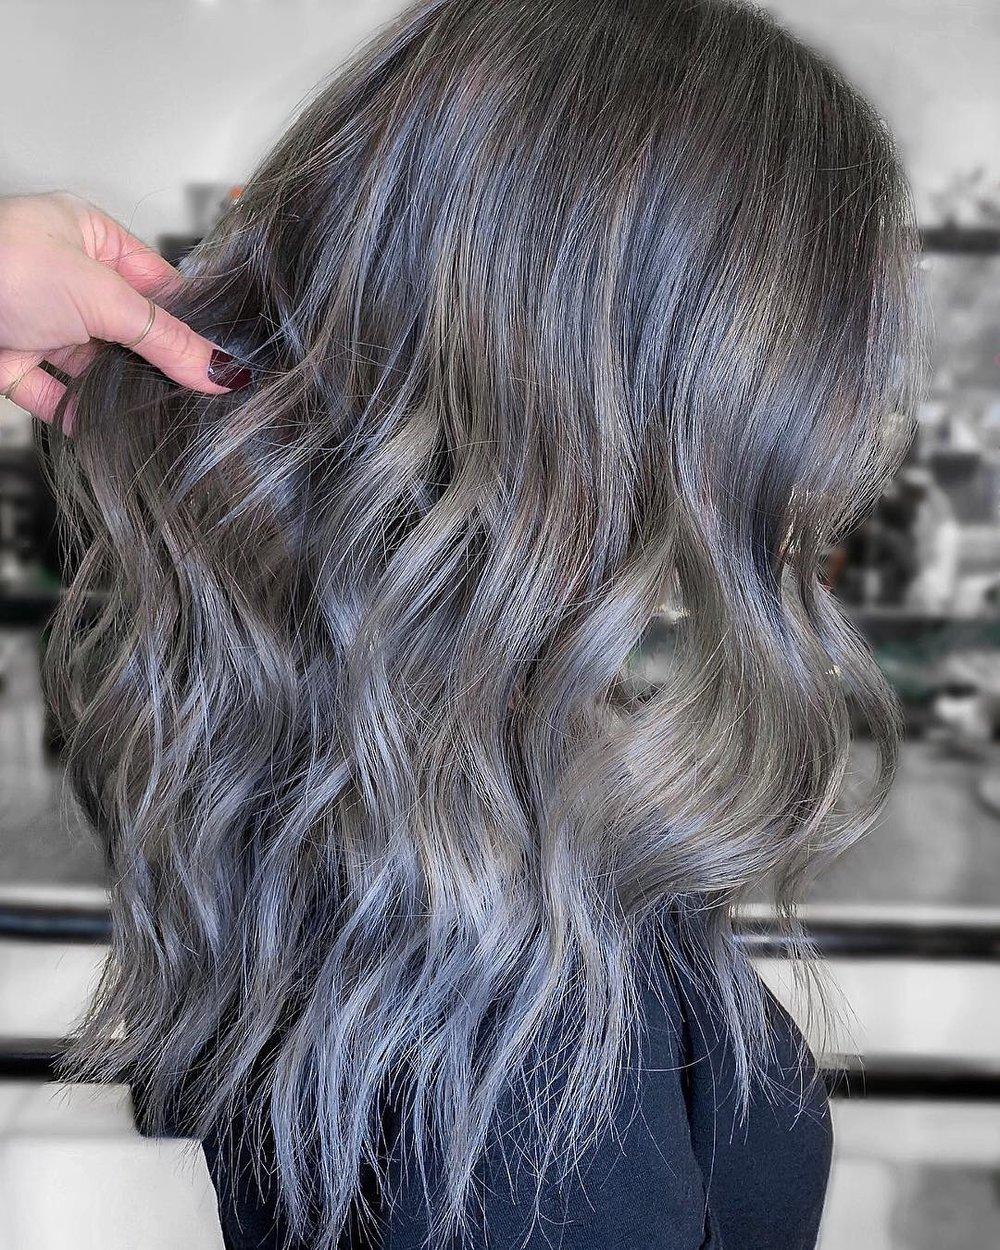 Wavy Hair Product.jpg